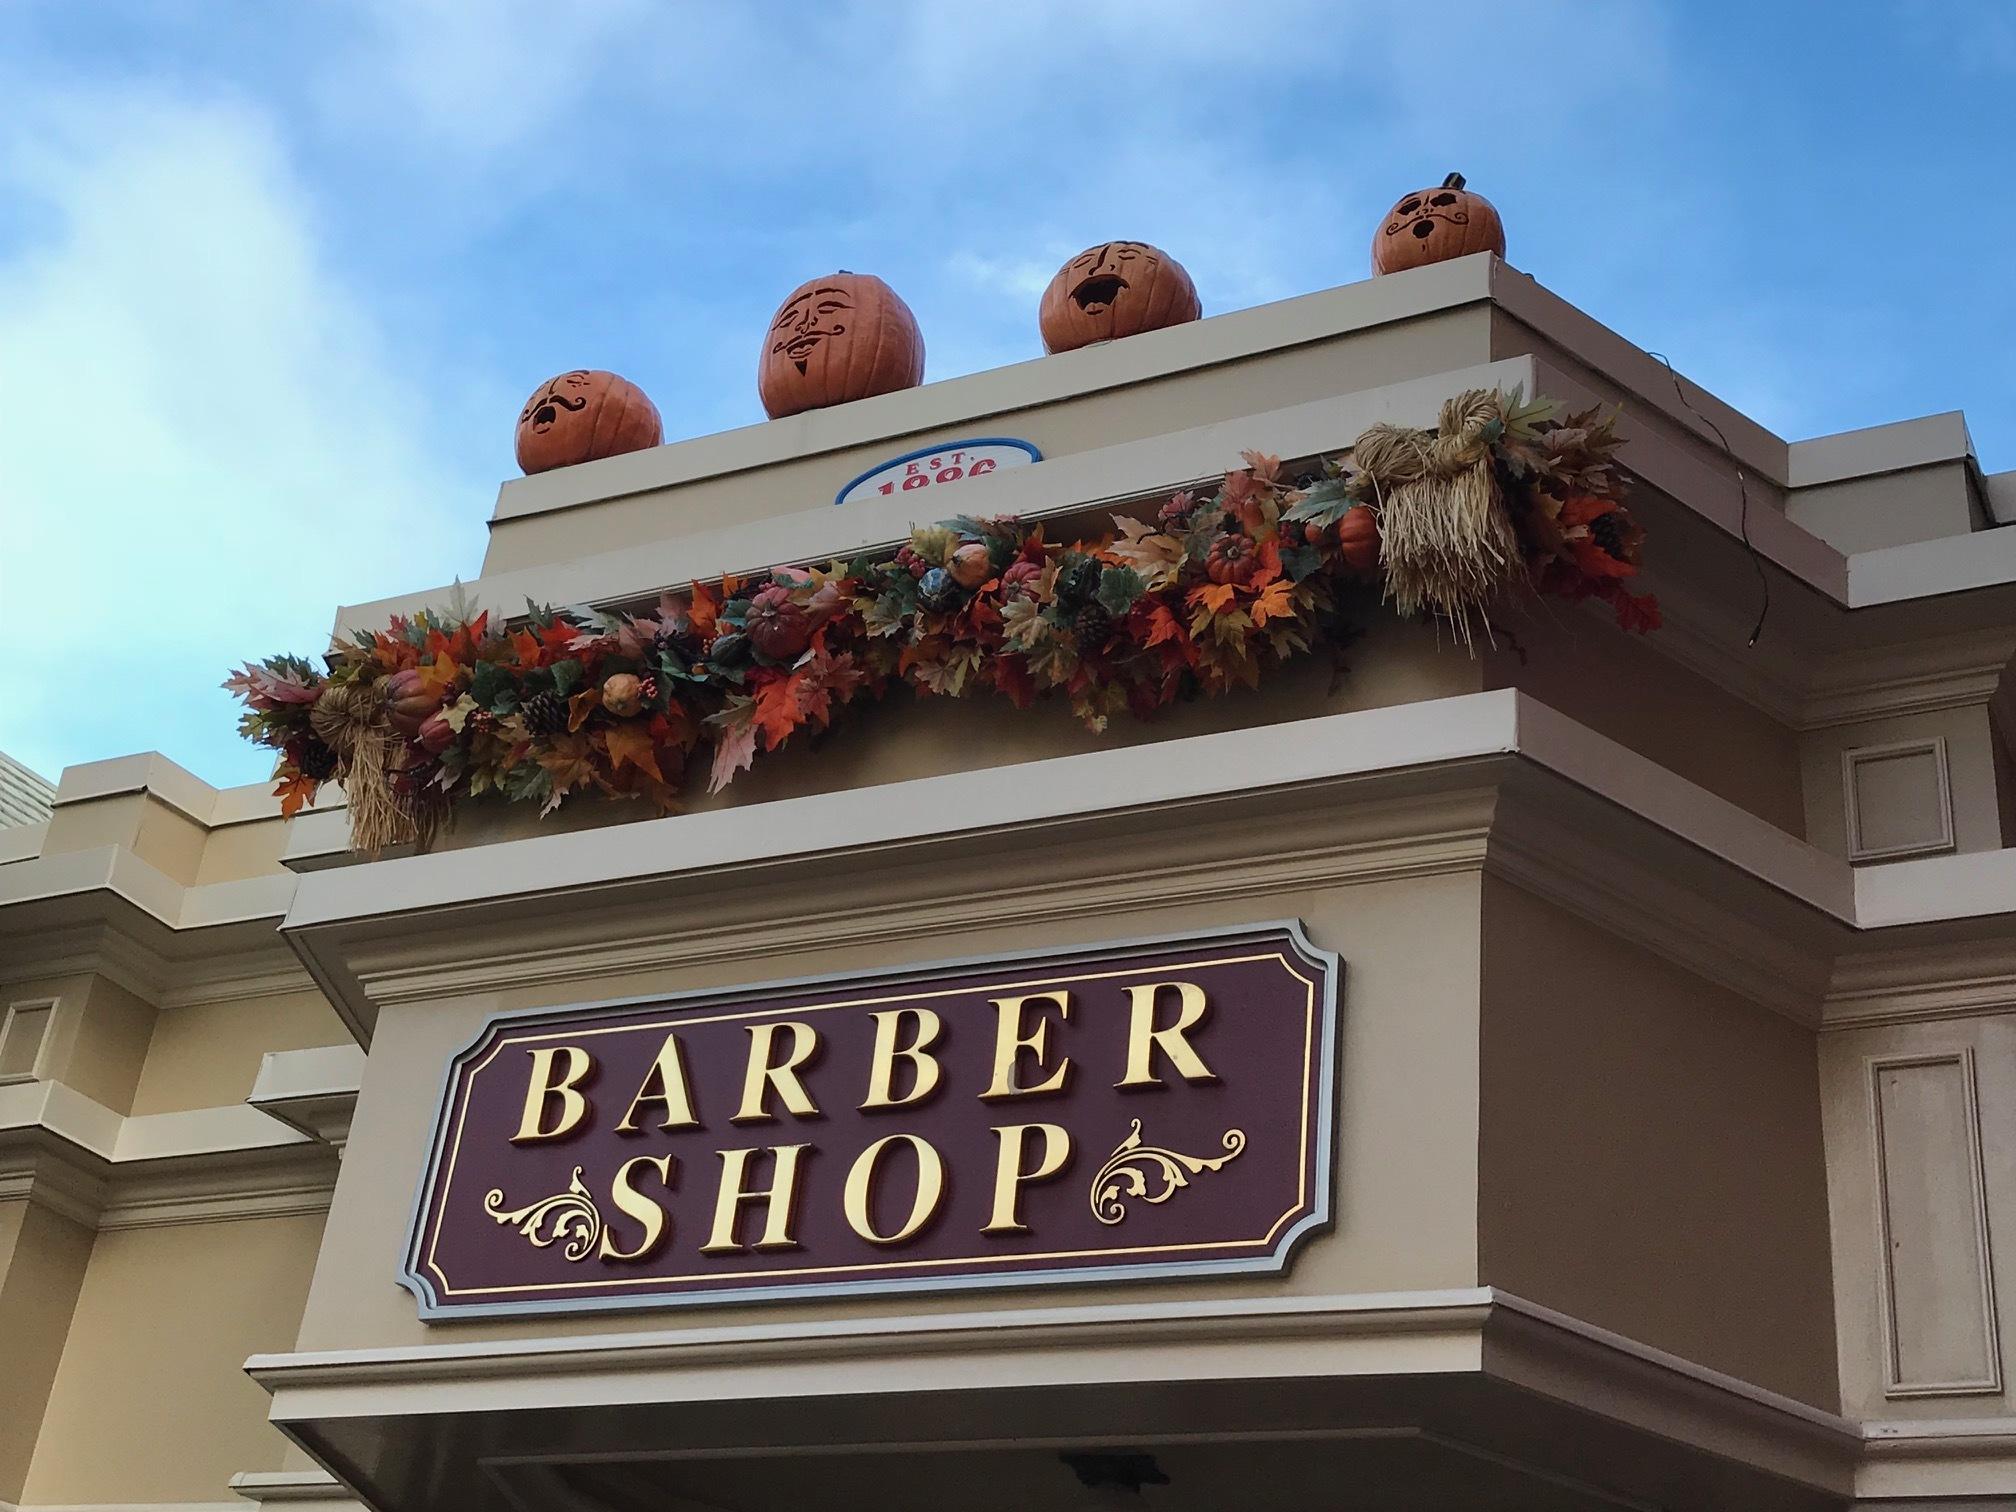 Barber Shop on Main Street USA